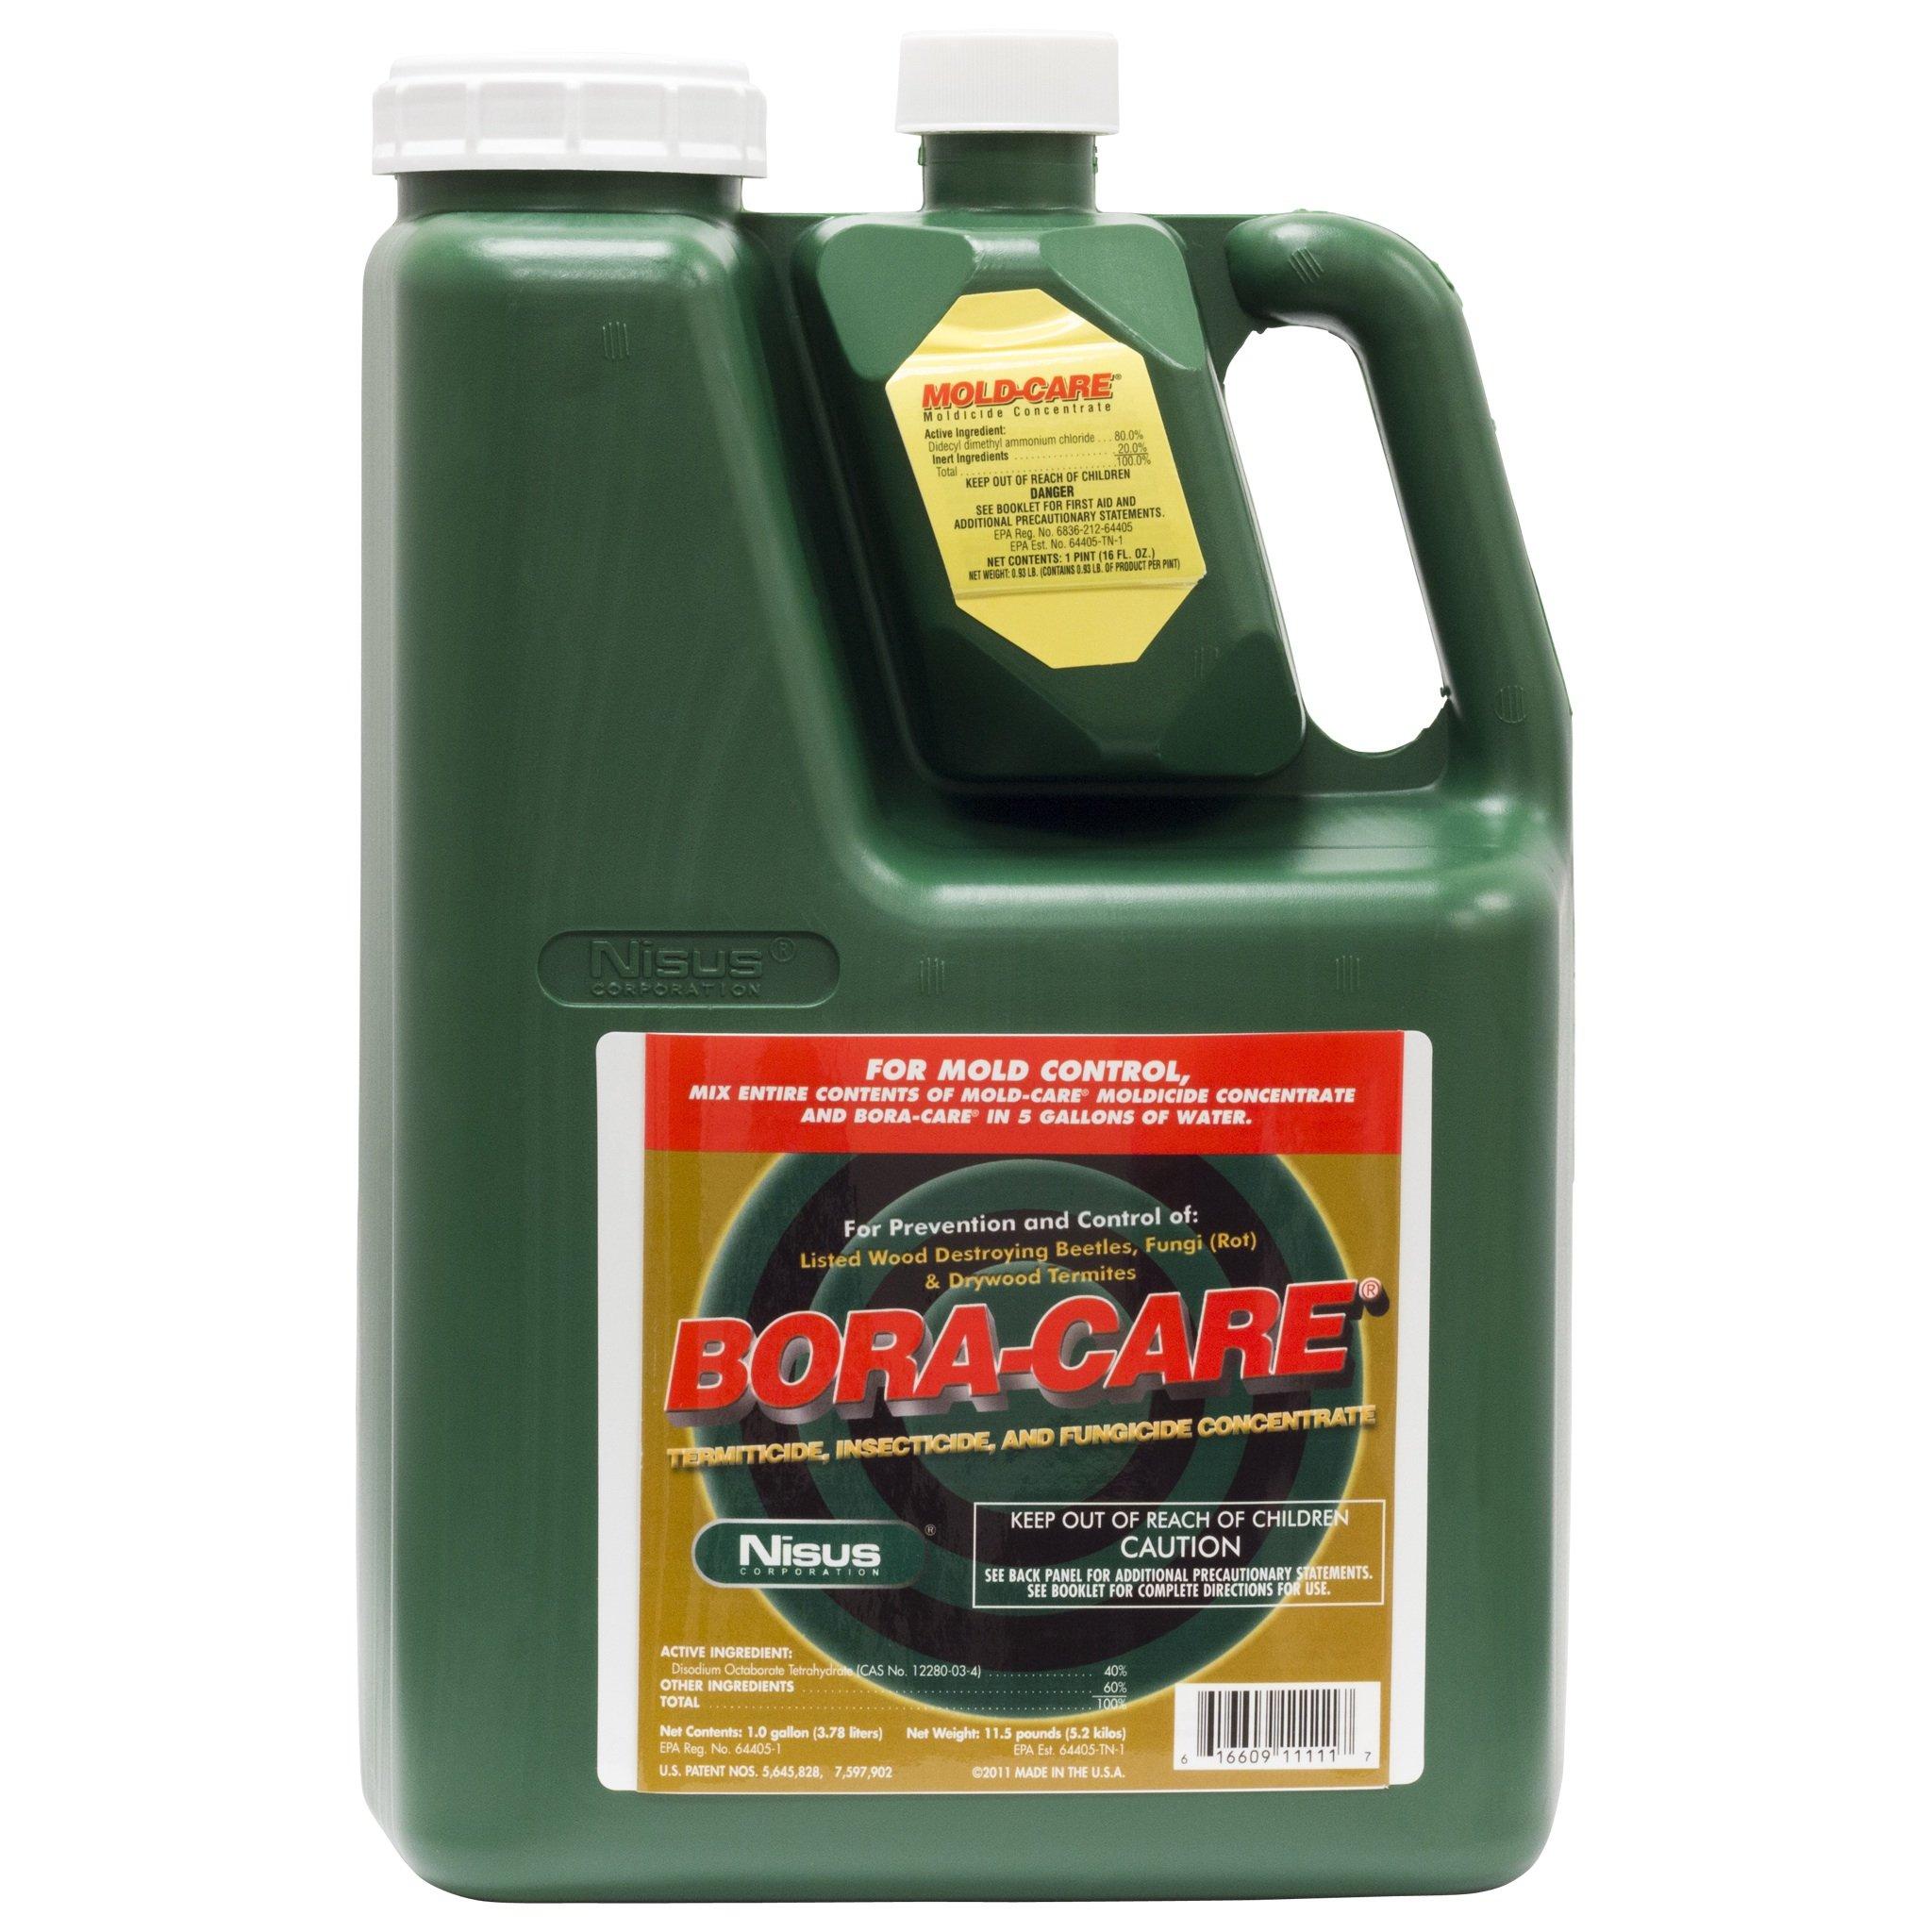 Bora-Care® with Mold-Care 1 Gallon 608794 by Boracare